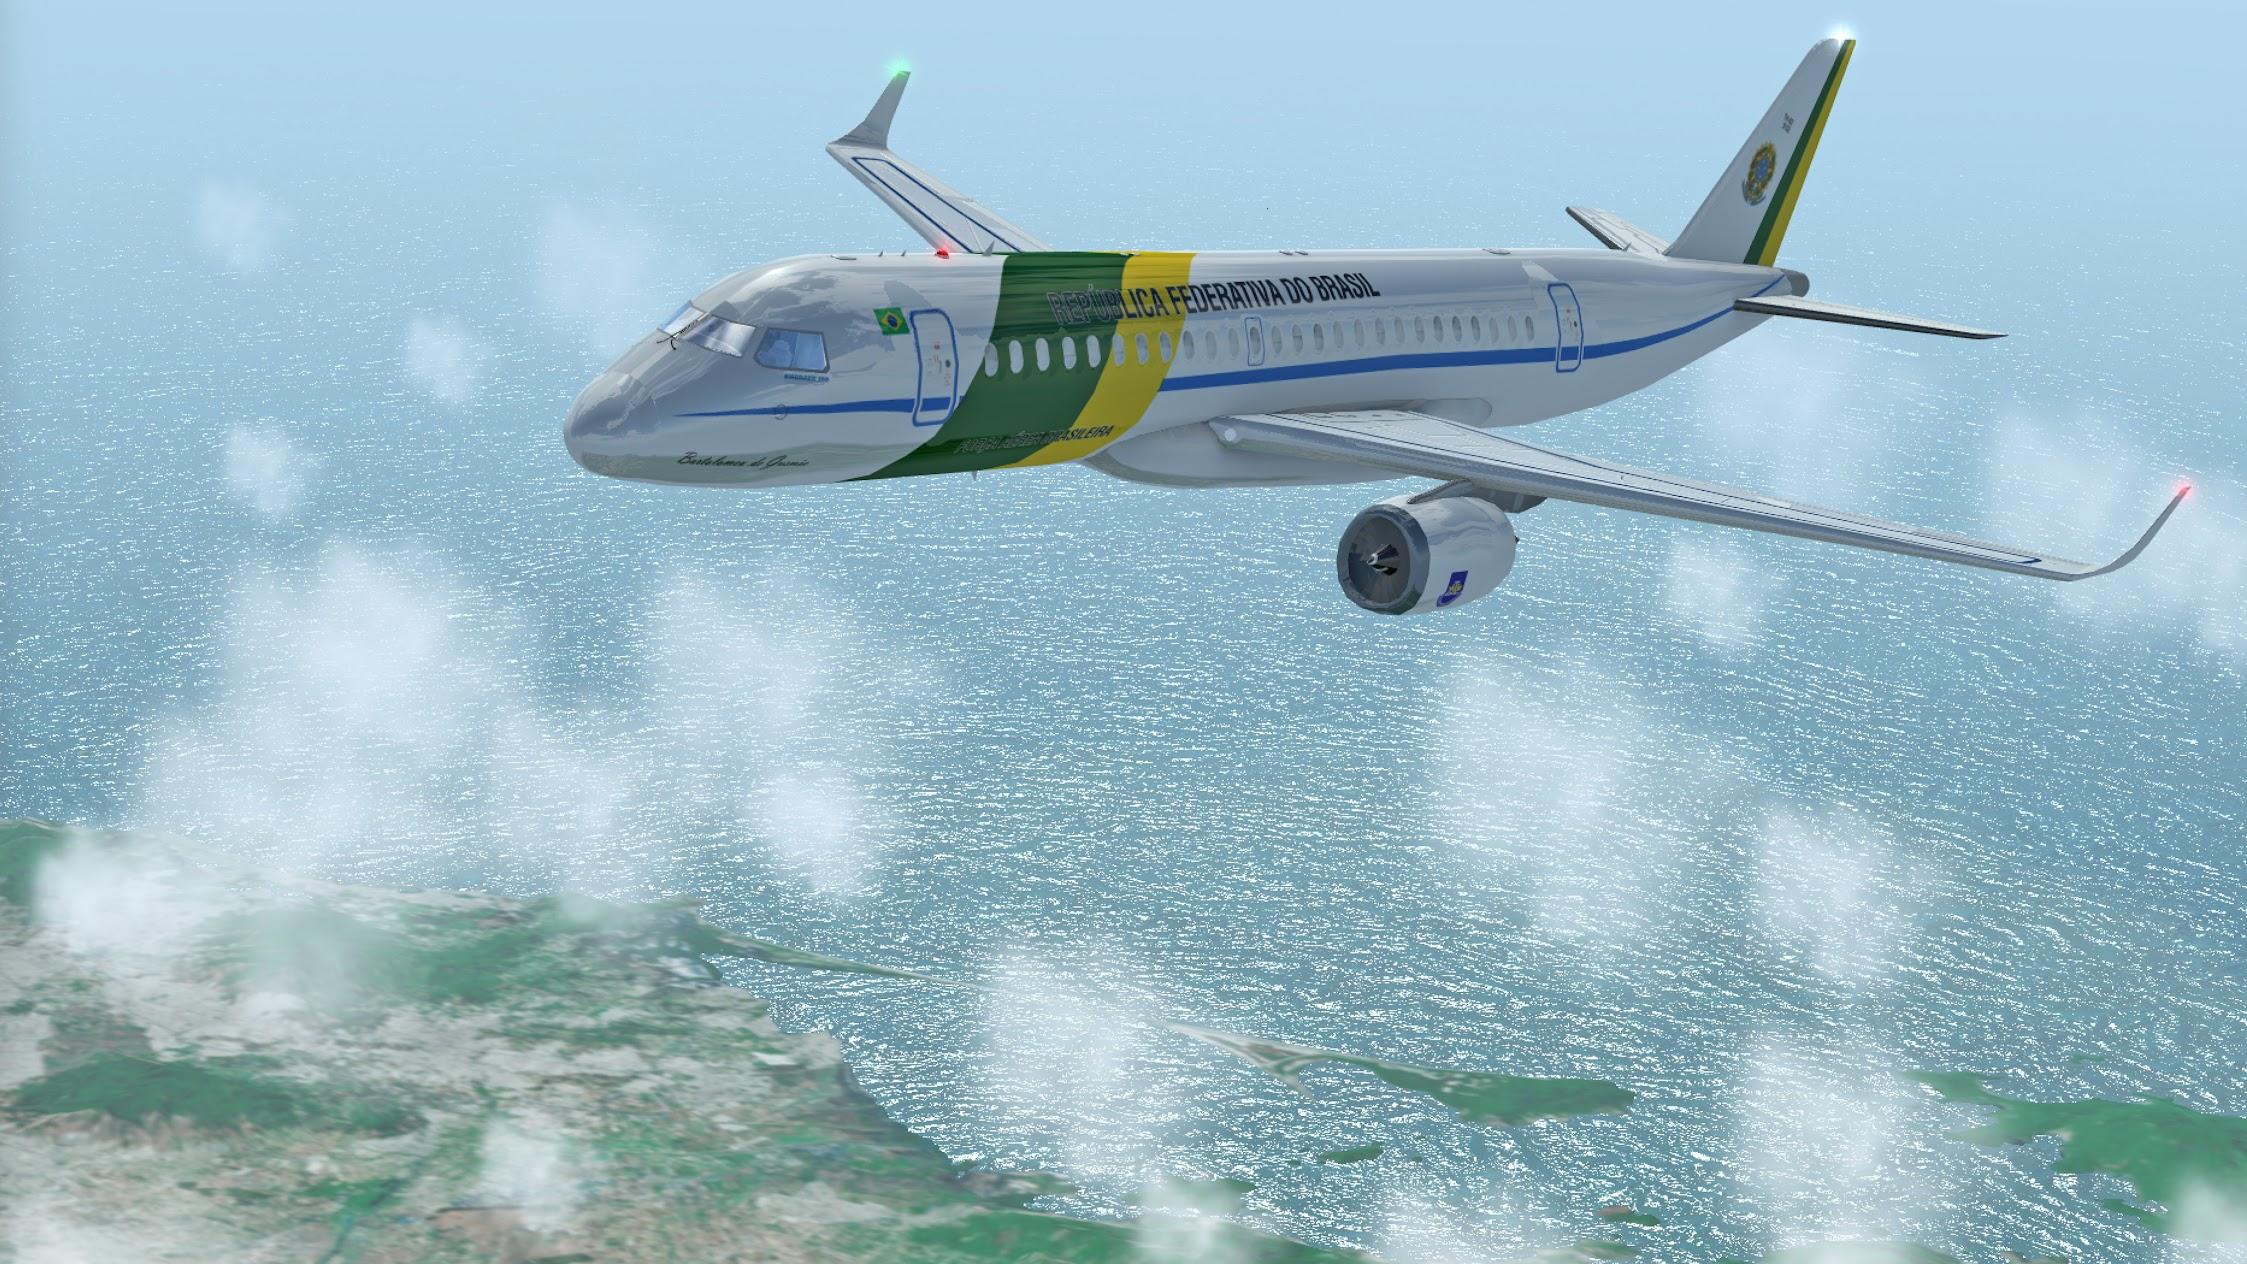 Thetis Games and Flight Simulators